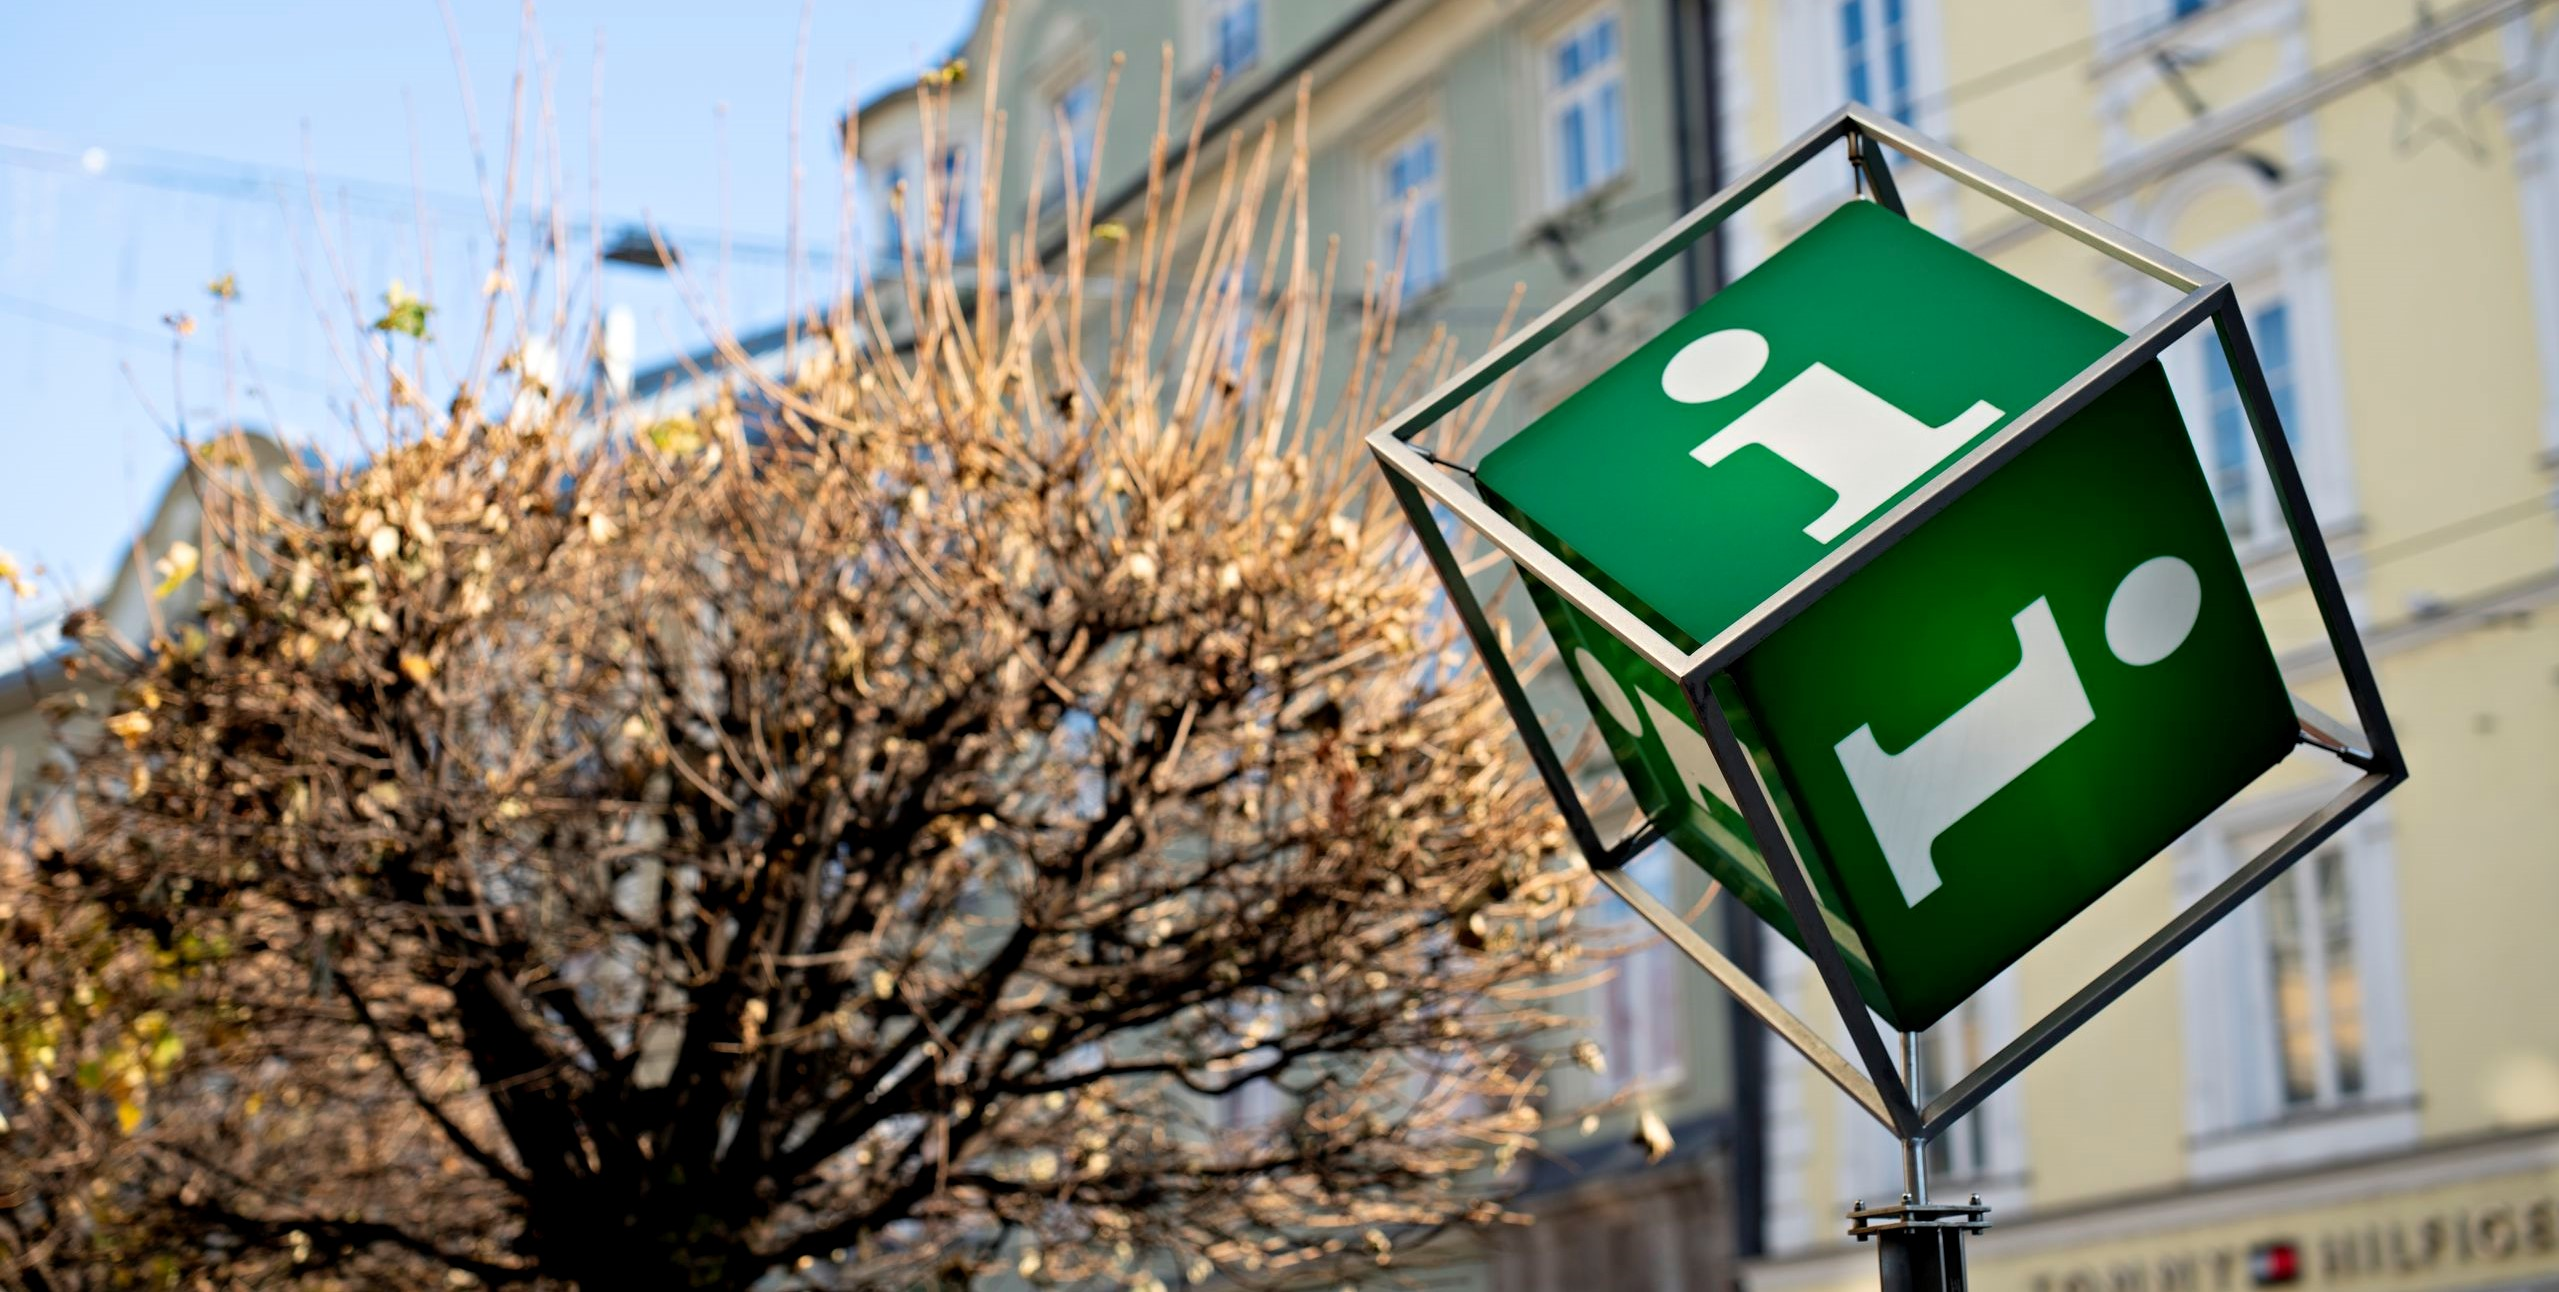 Info Würfel vor Innsbruck Information